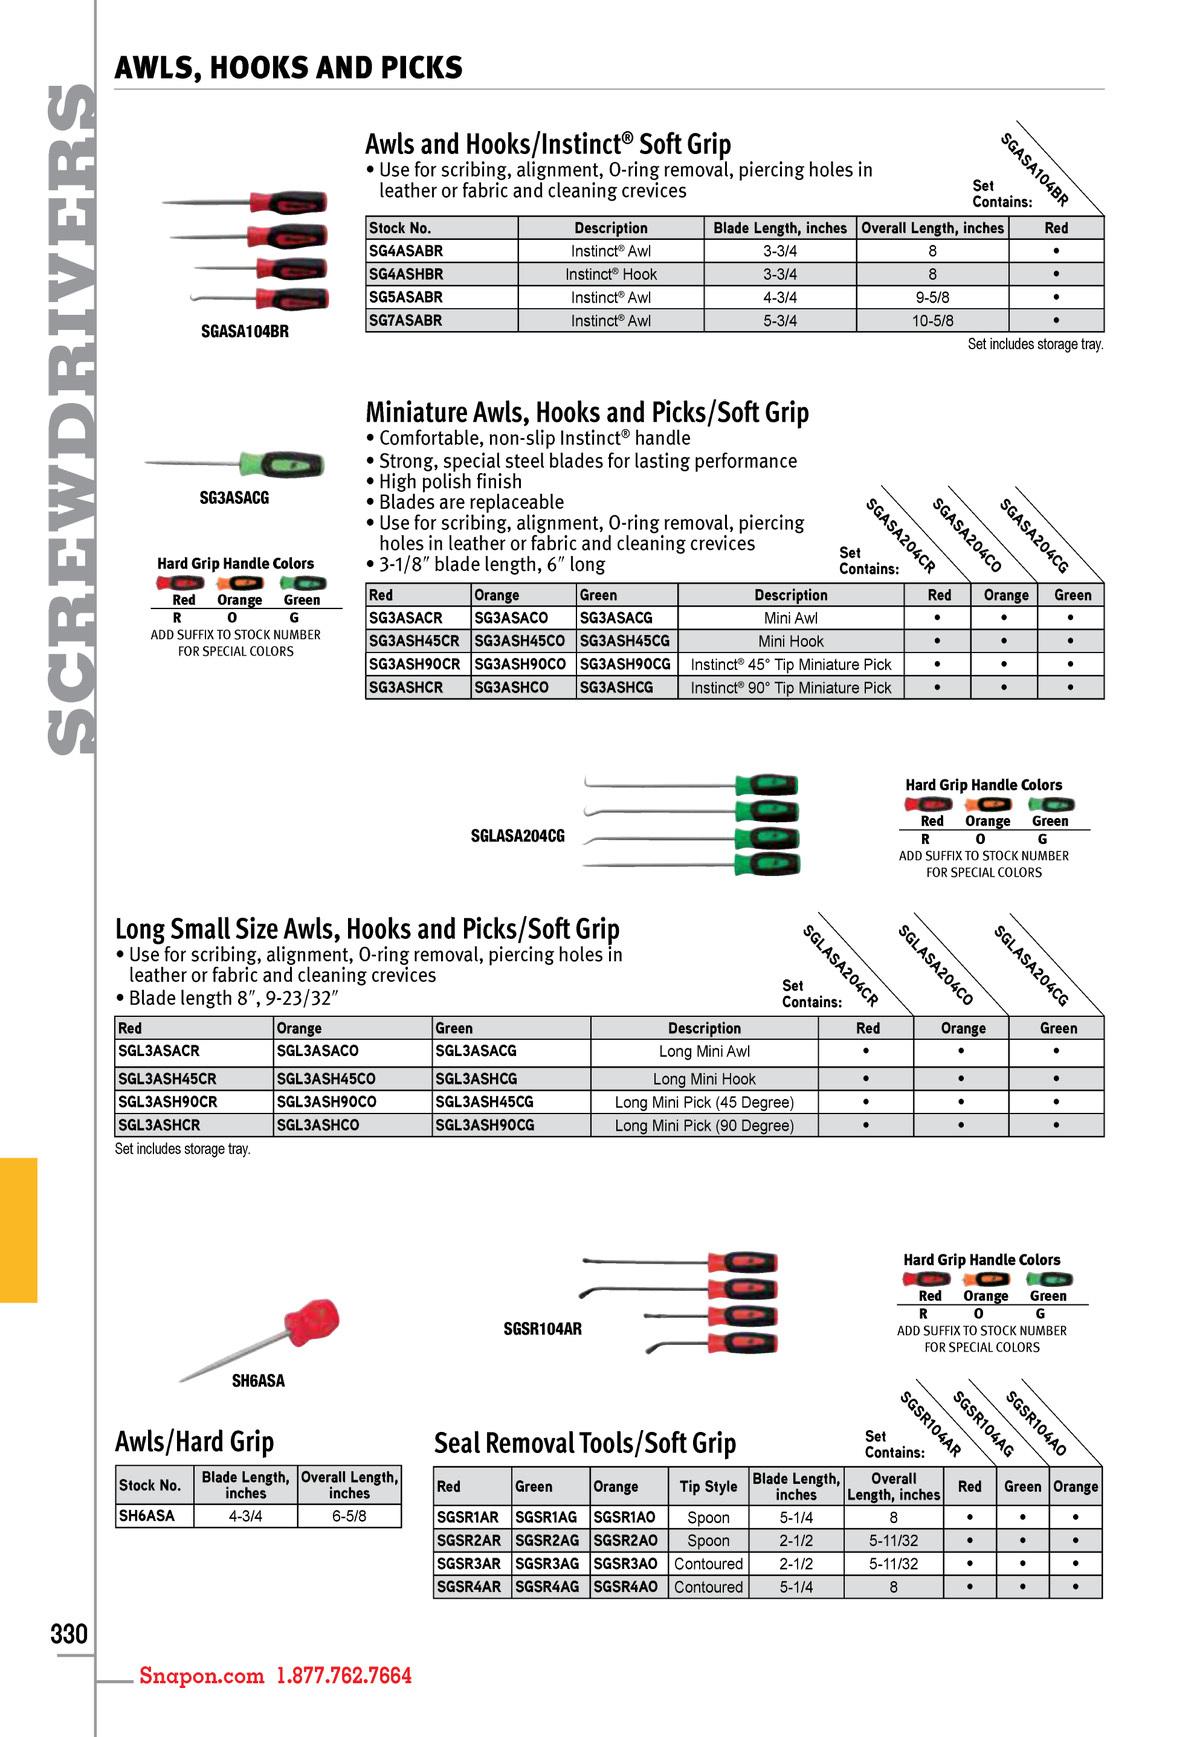 Snap on Tools Catalog English Catalog 1400